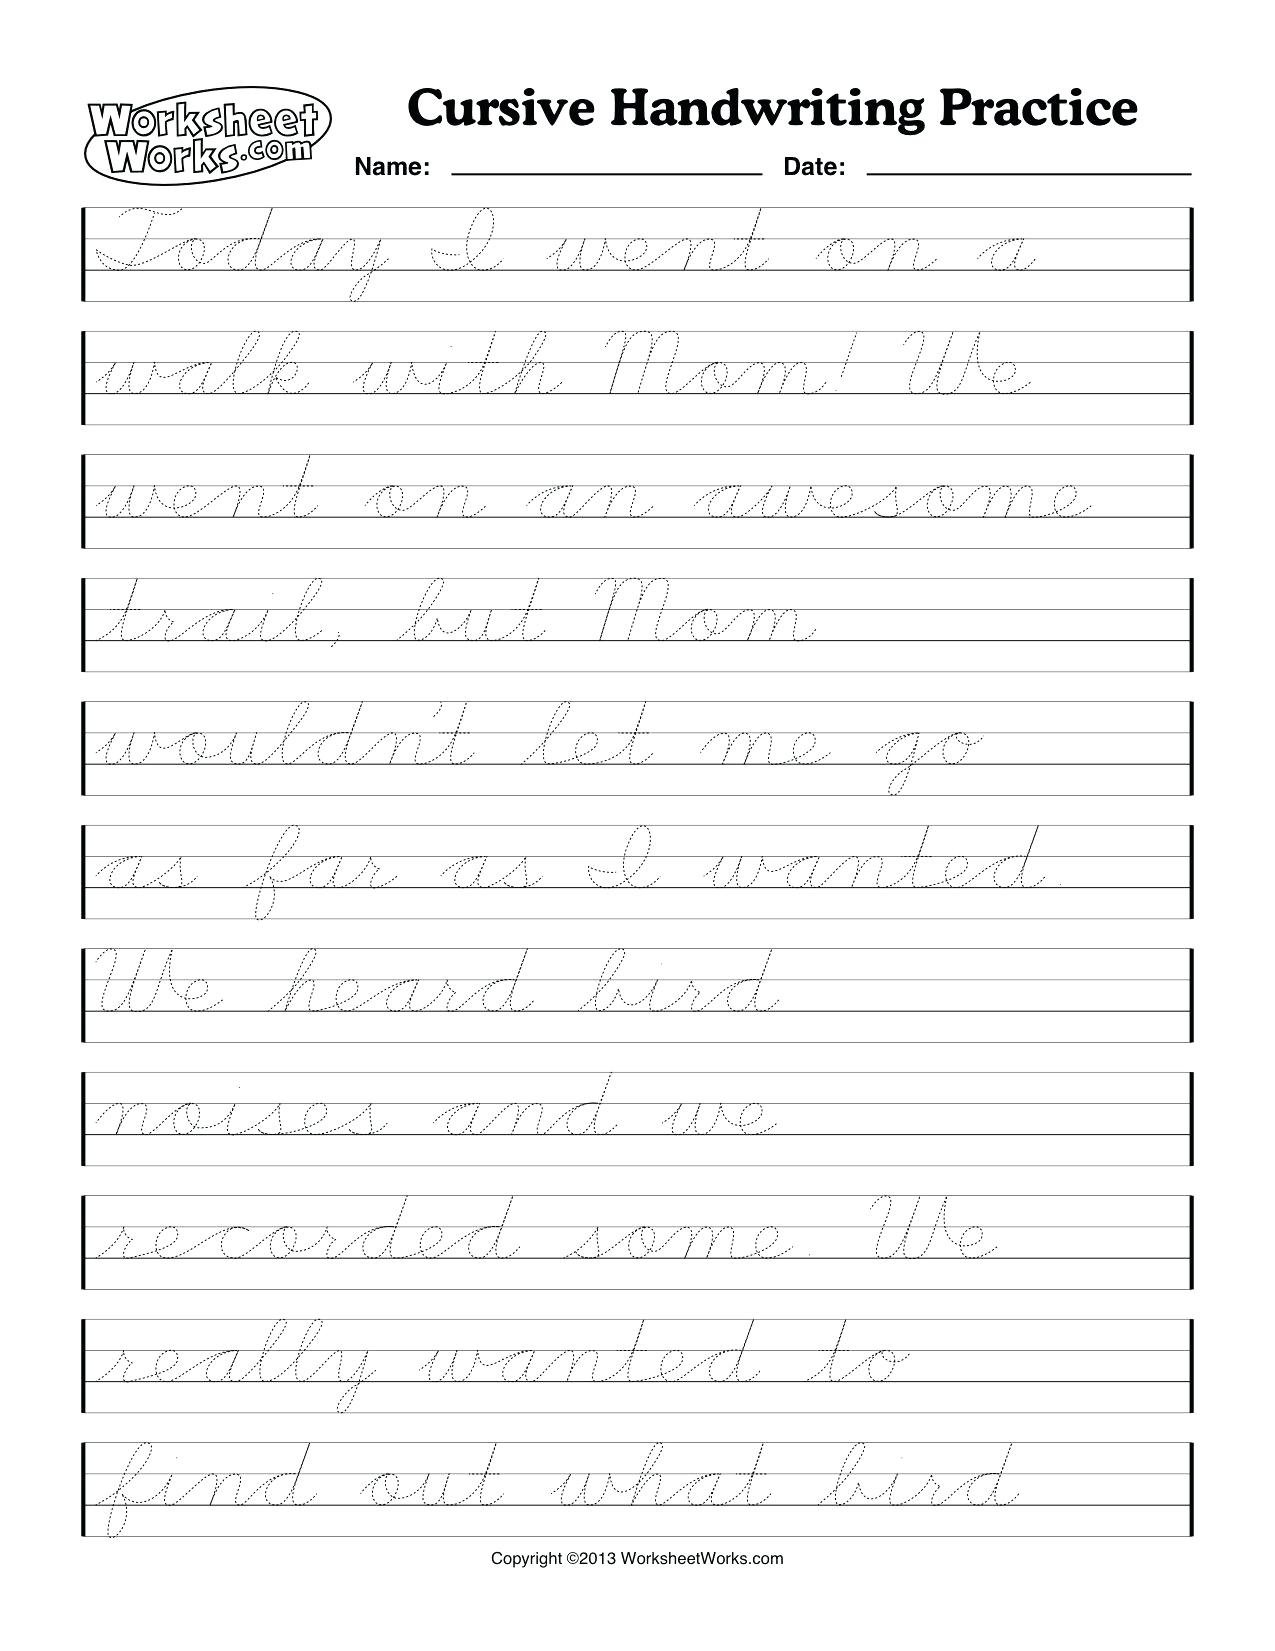 What Is Cursive Handwriting Cursive Handwriting Worksheets Cursive | Cursive Handwriting Worksheets Ks1 Printable